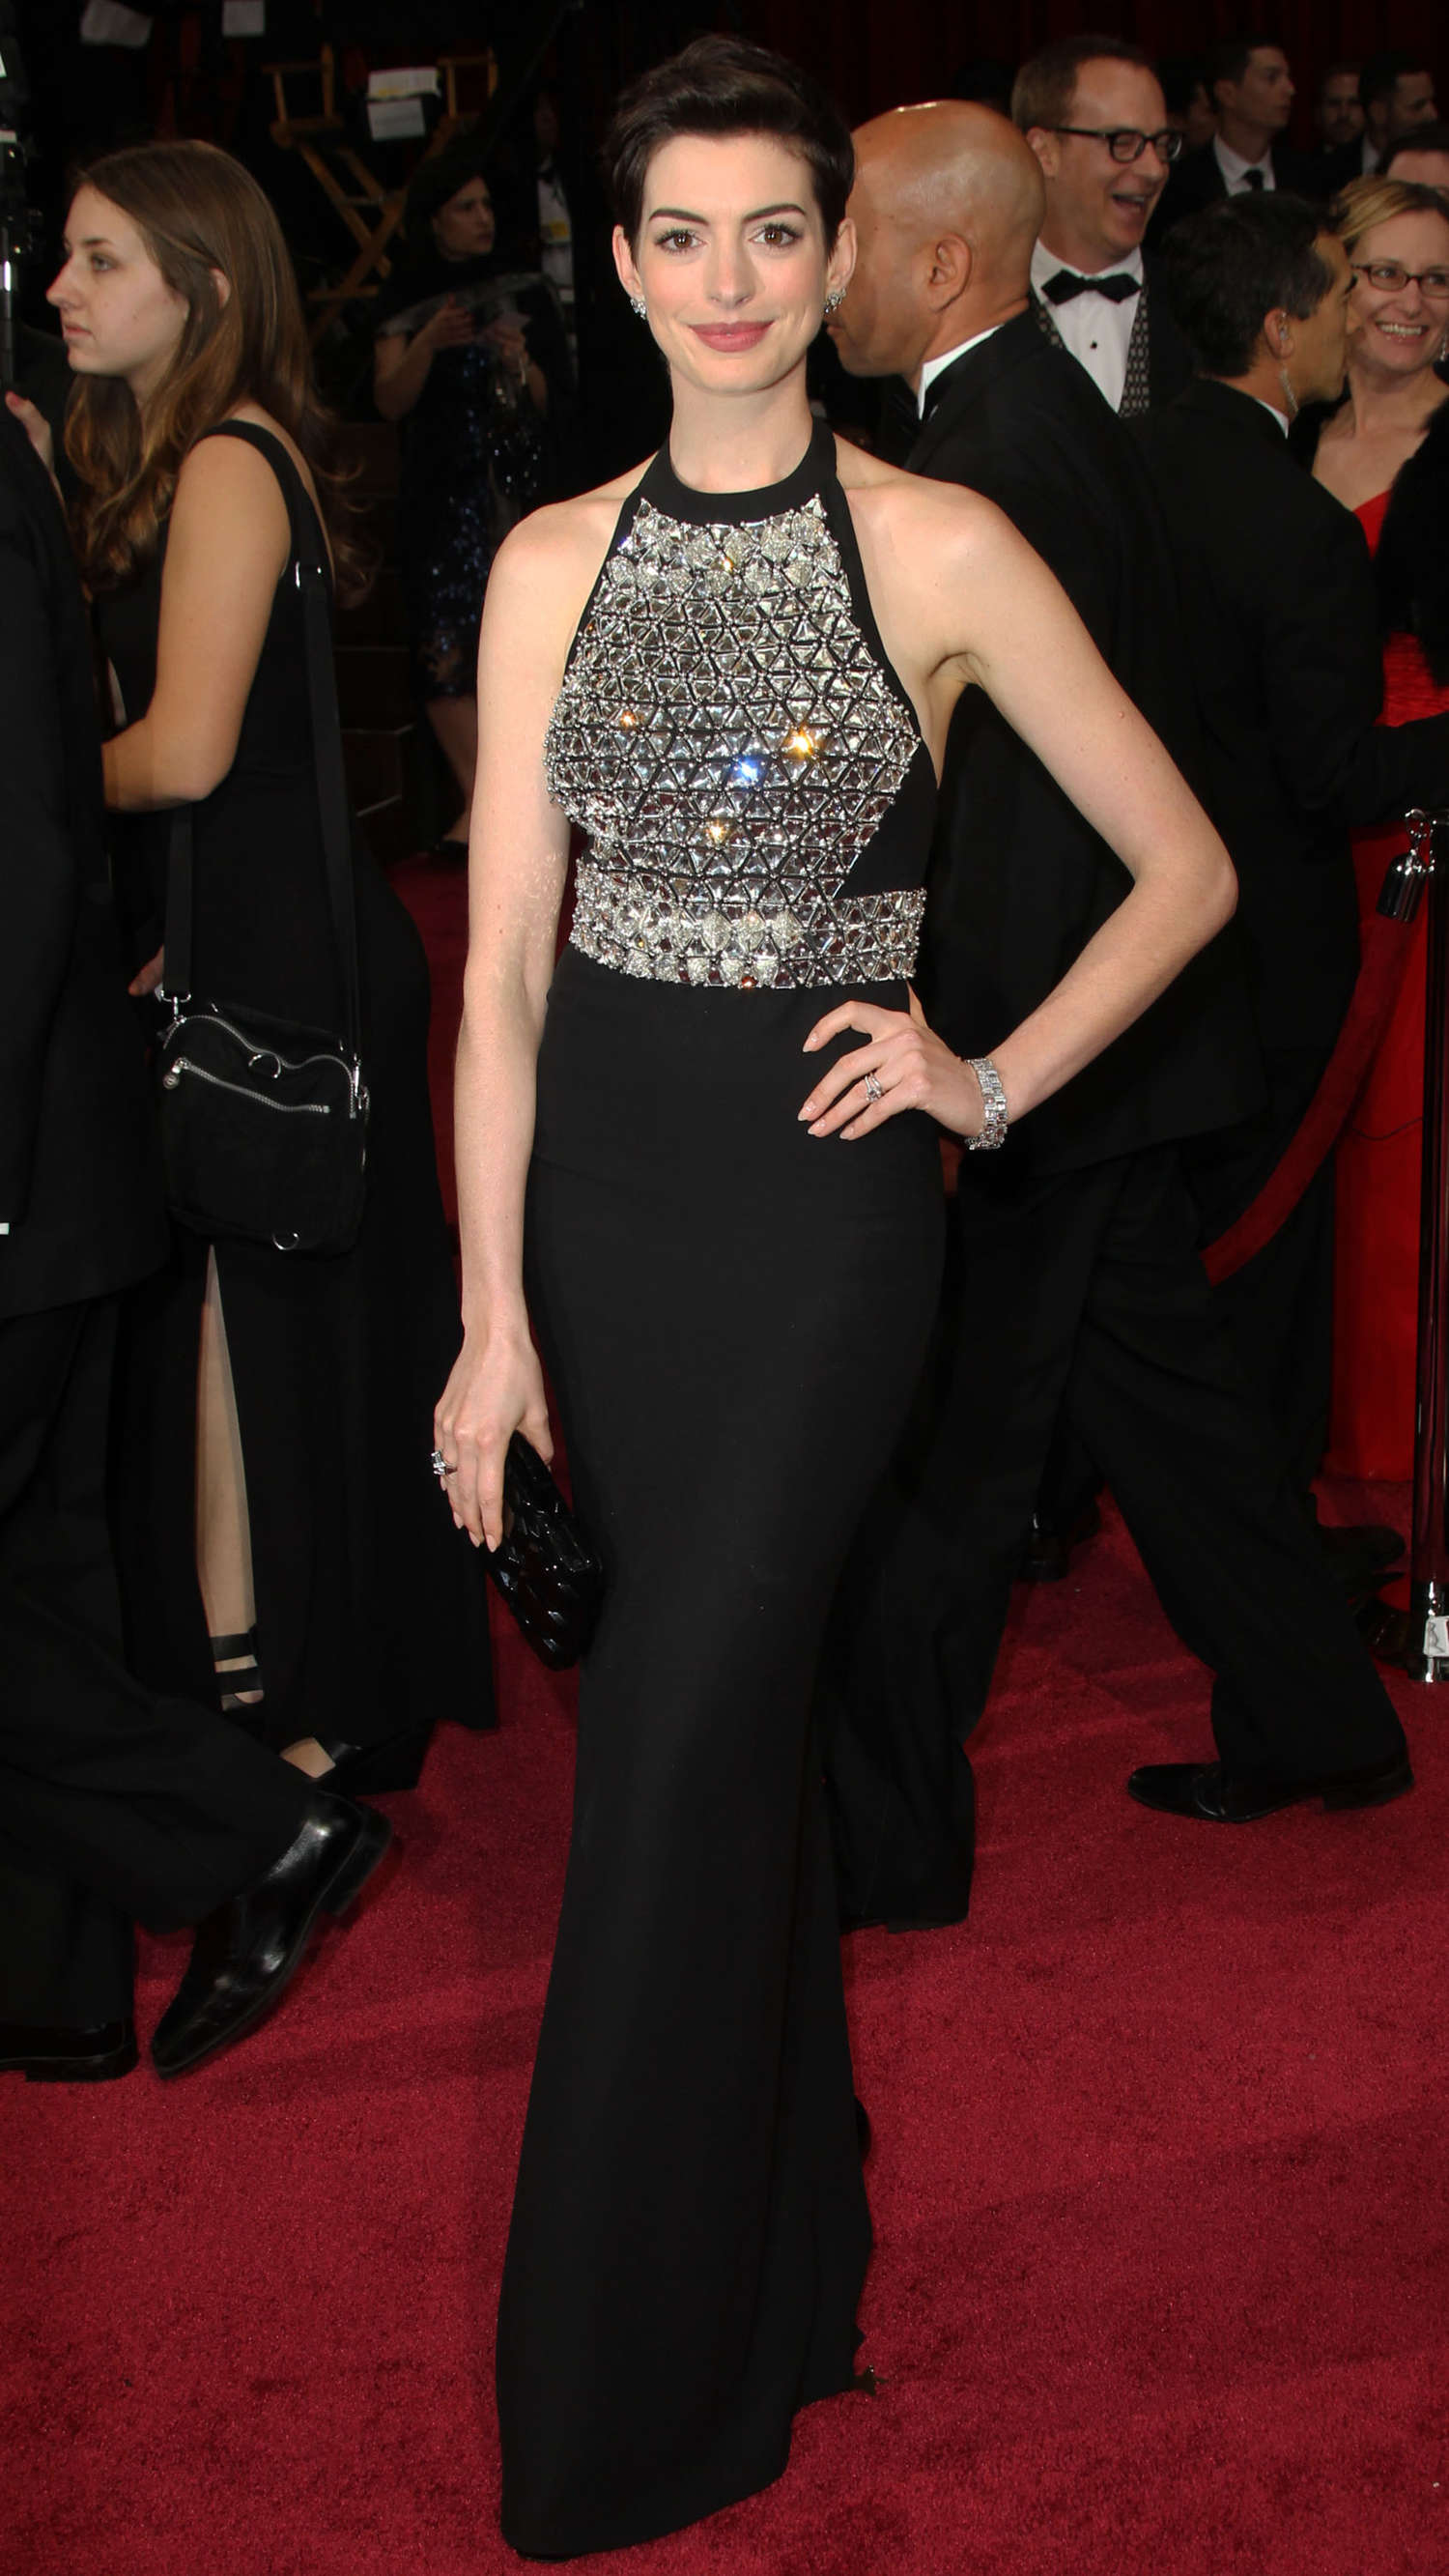 Anne Hathaway - 2013 BAFTA Awards in London-01 - GotCeleb